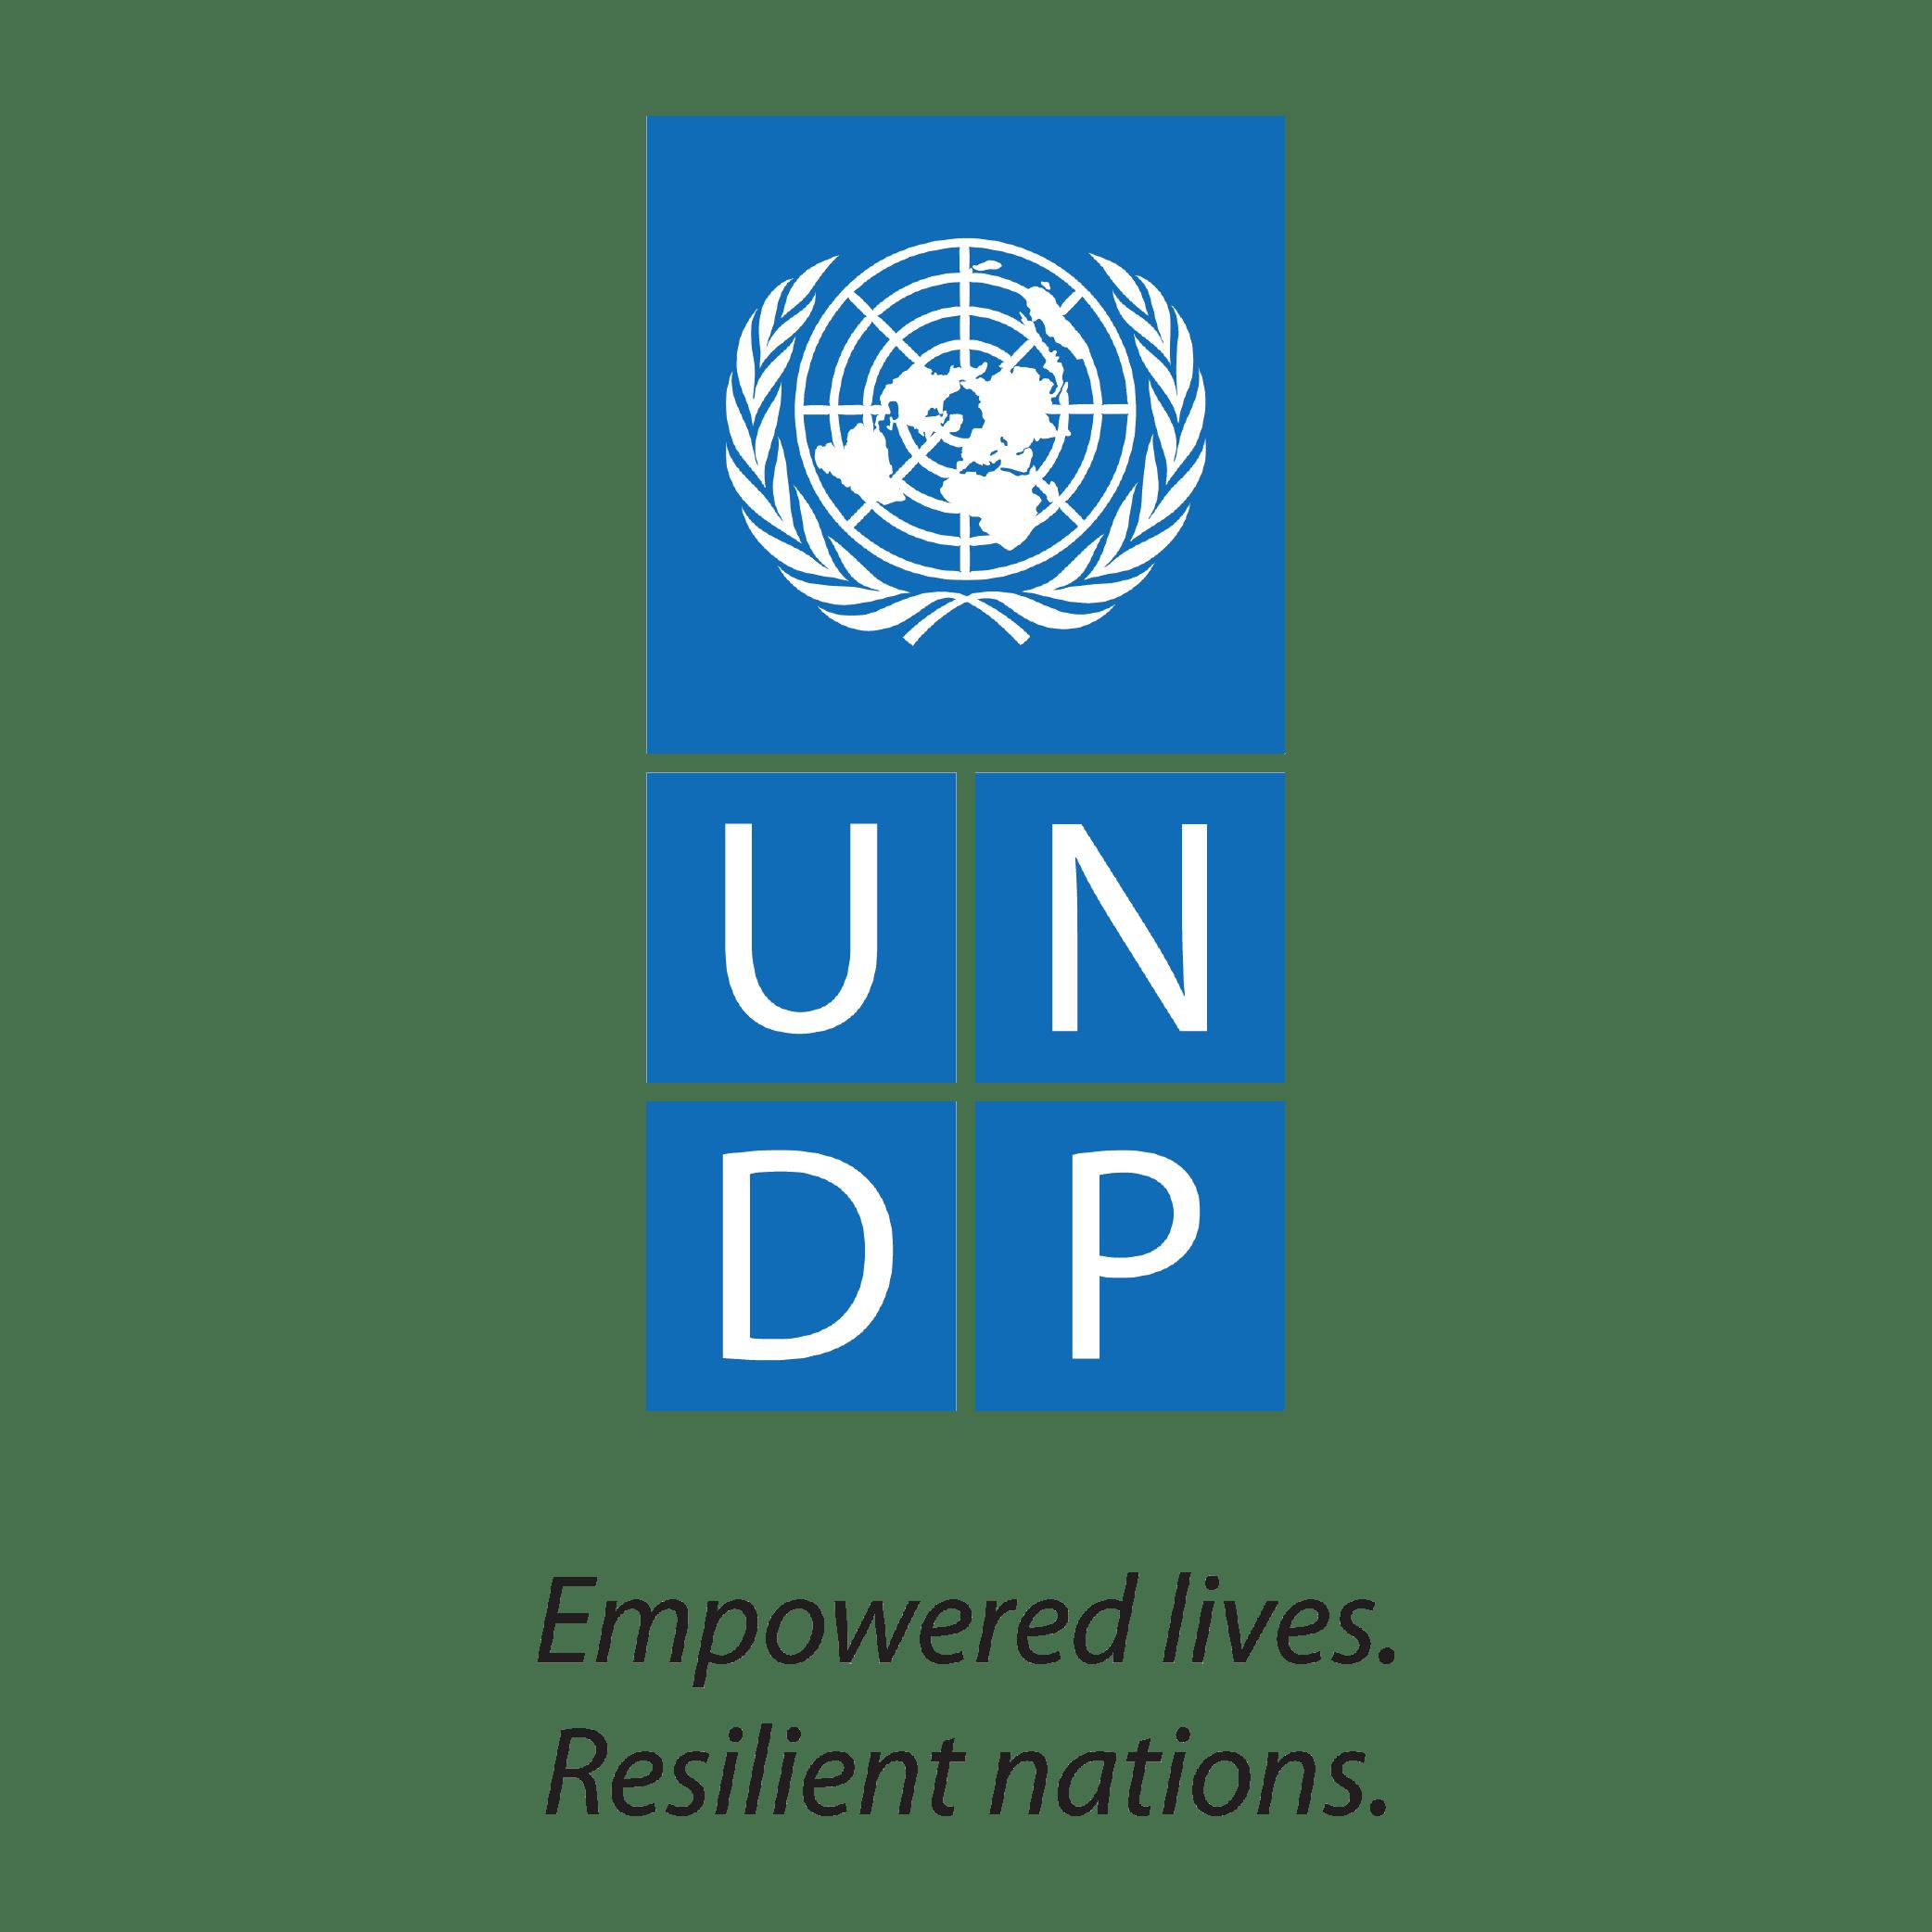 200219_ logo for website_UNDP